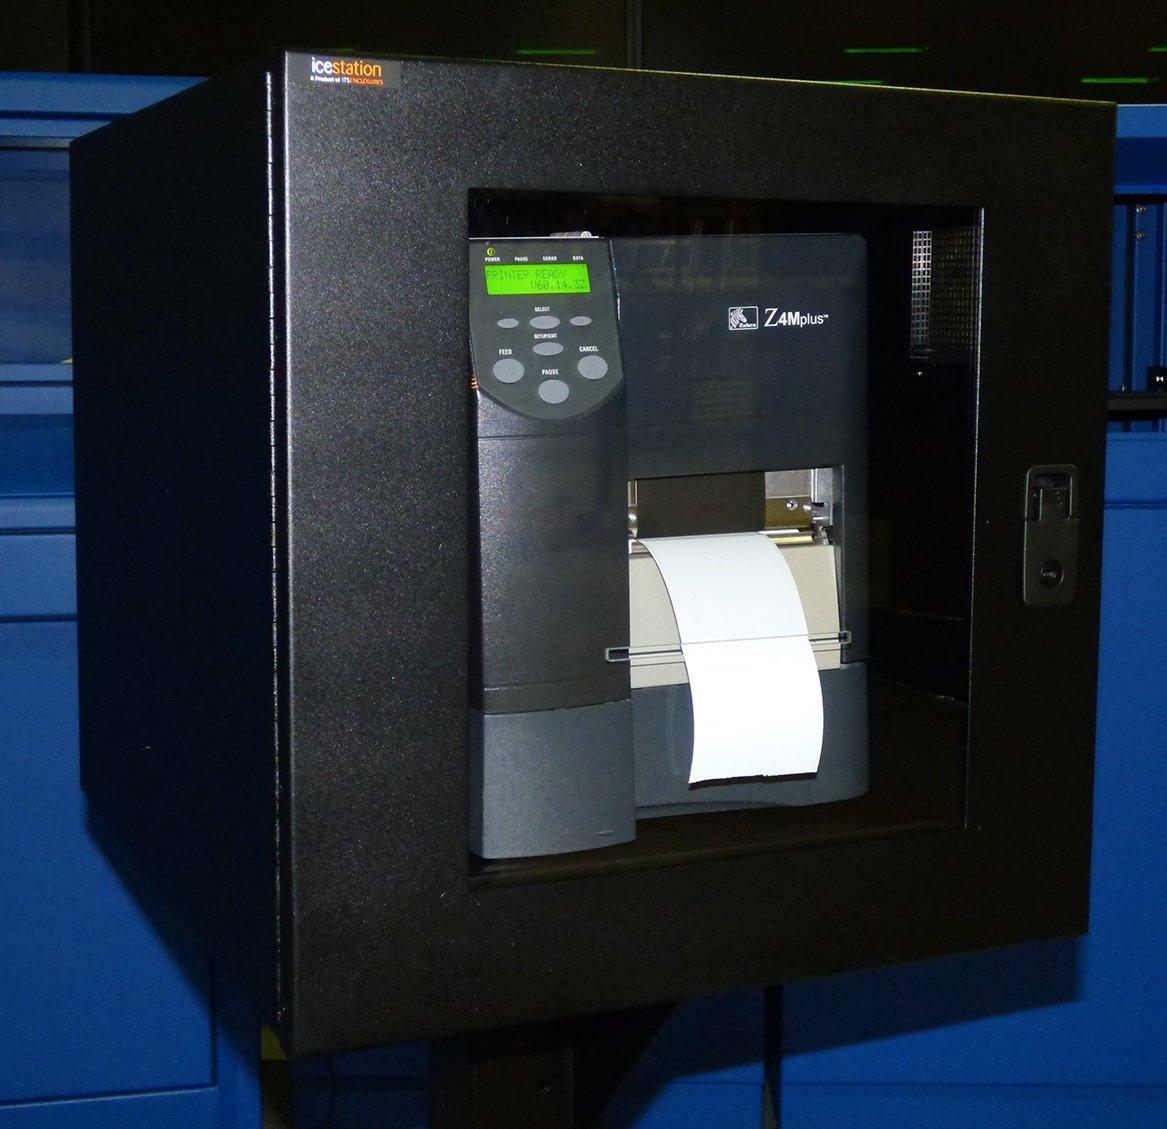 PB202024_zebra_printer_enclosure_itsenclosures_icestation.jpg